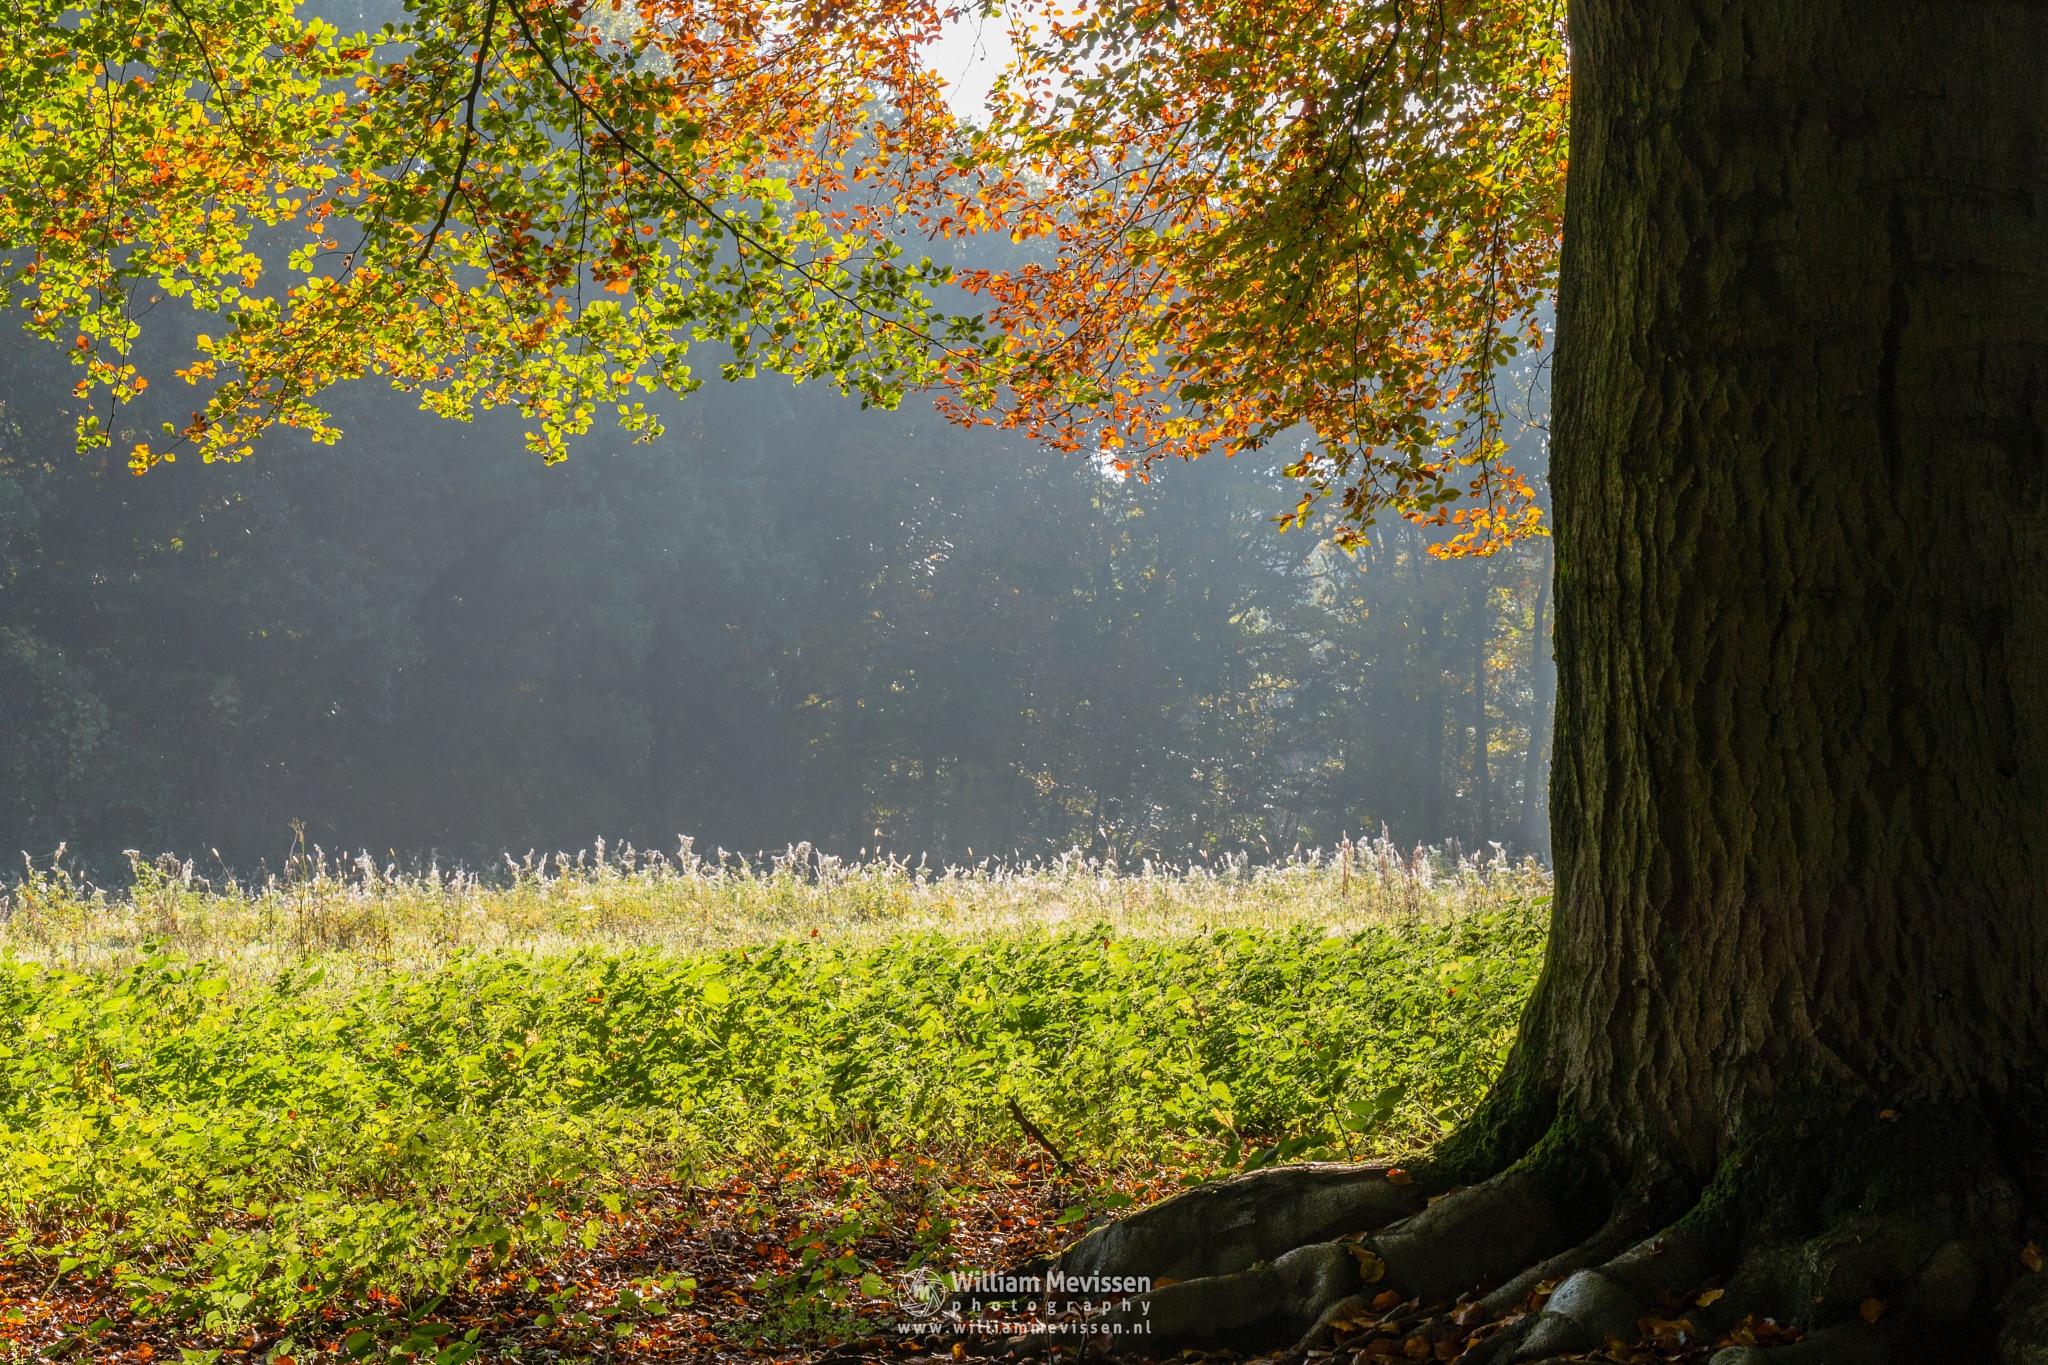 Autumn's Big Foot by William Mevissen